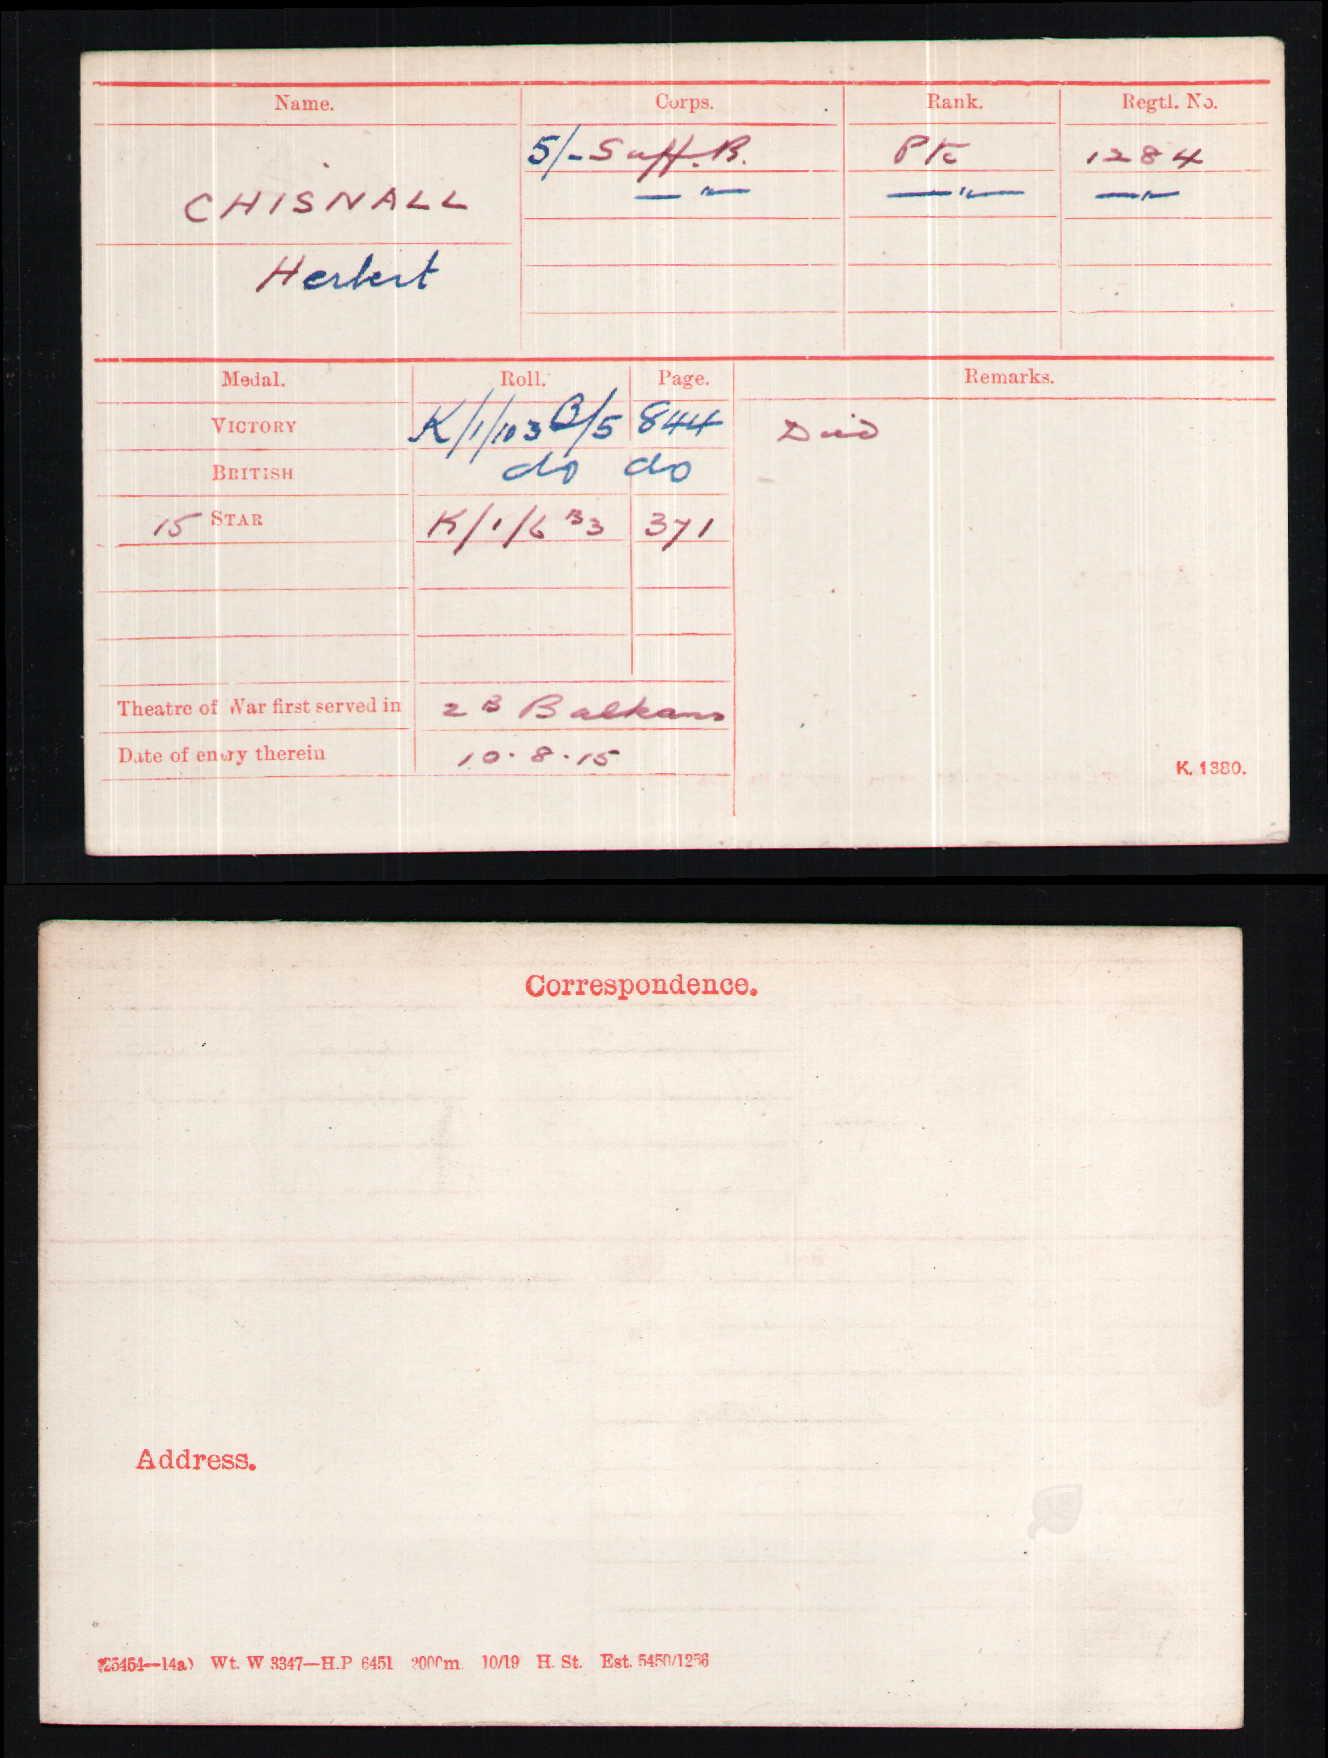 Herbert Chisnall medal card.jpg